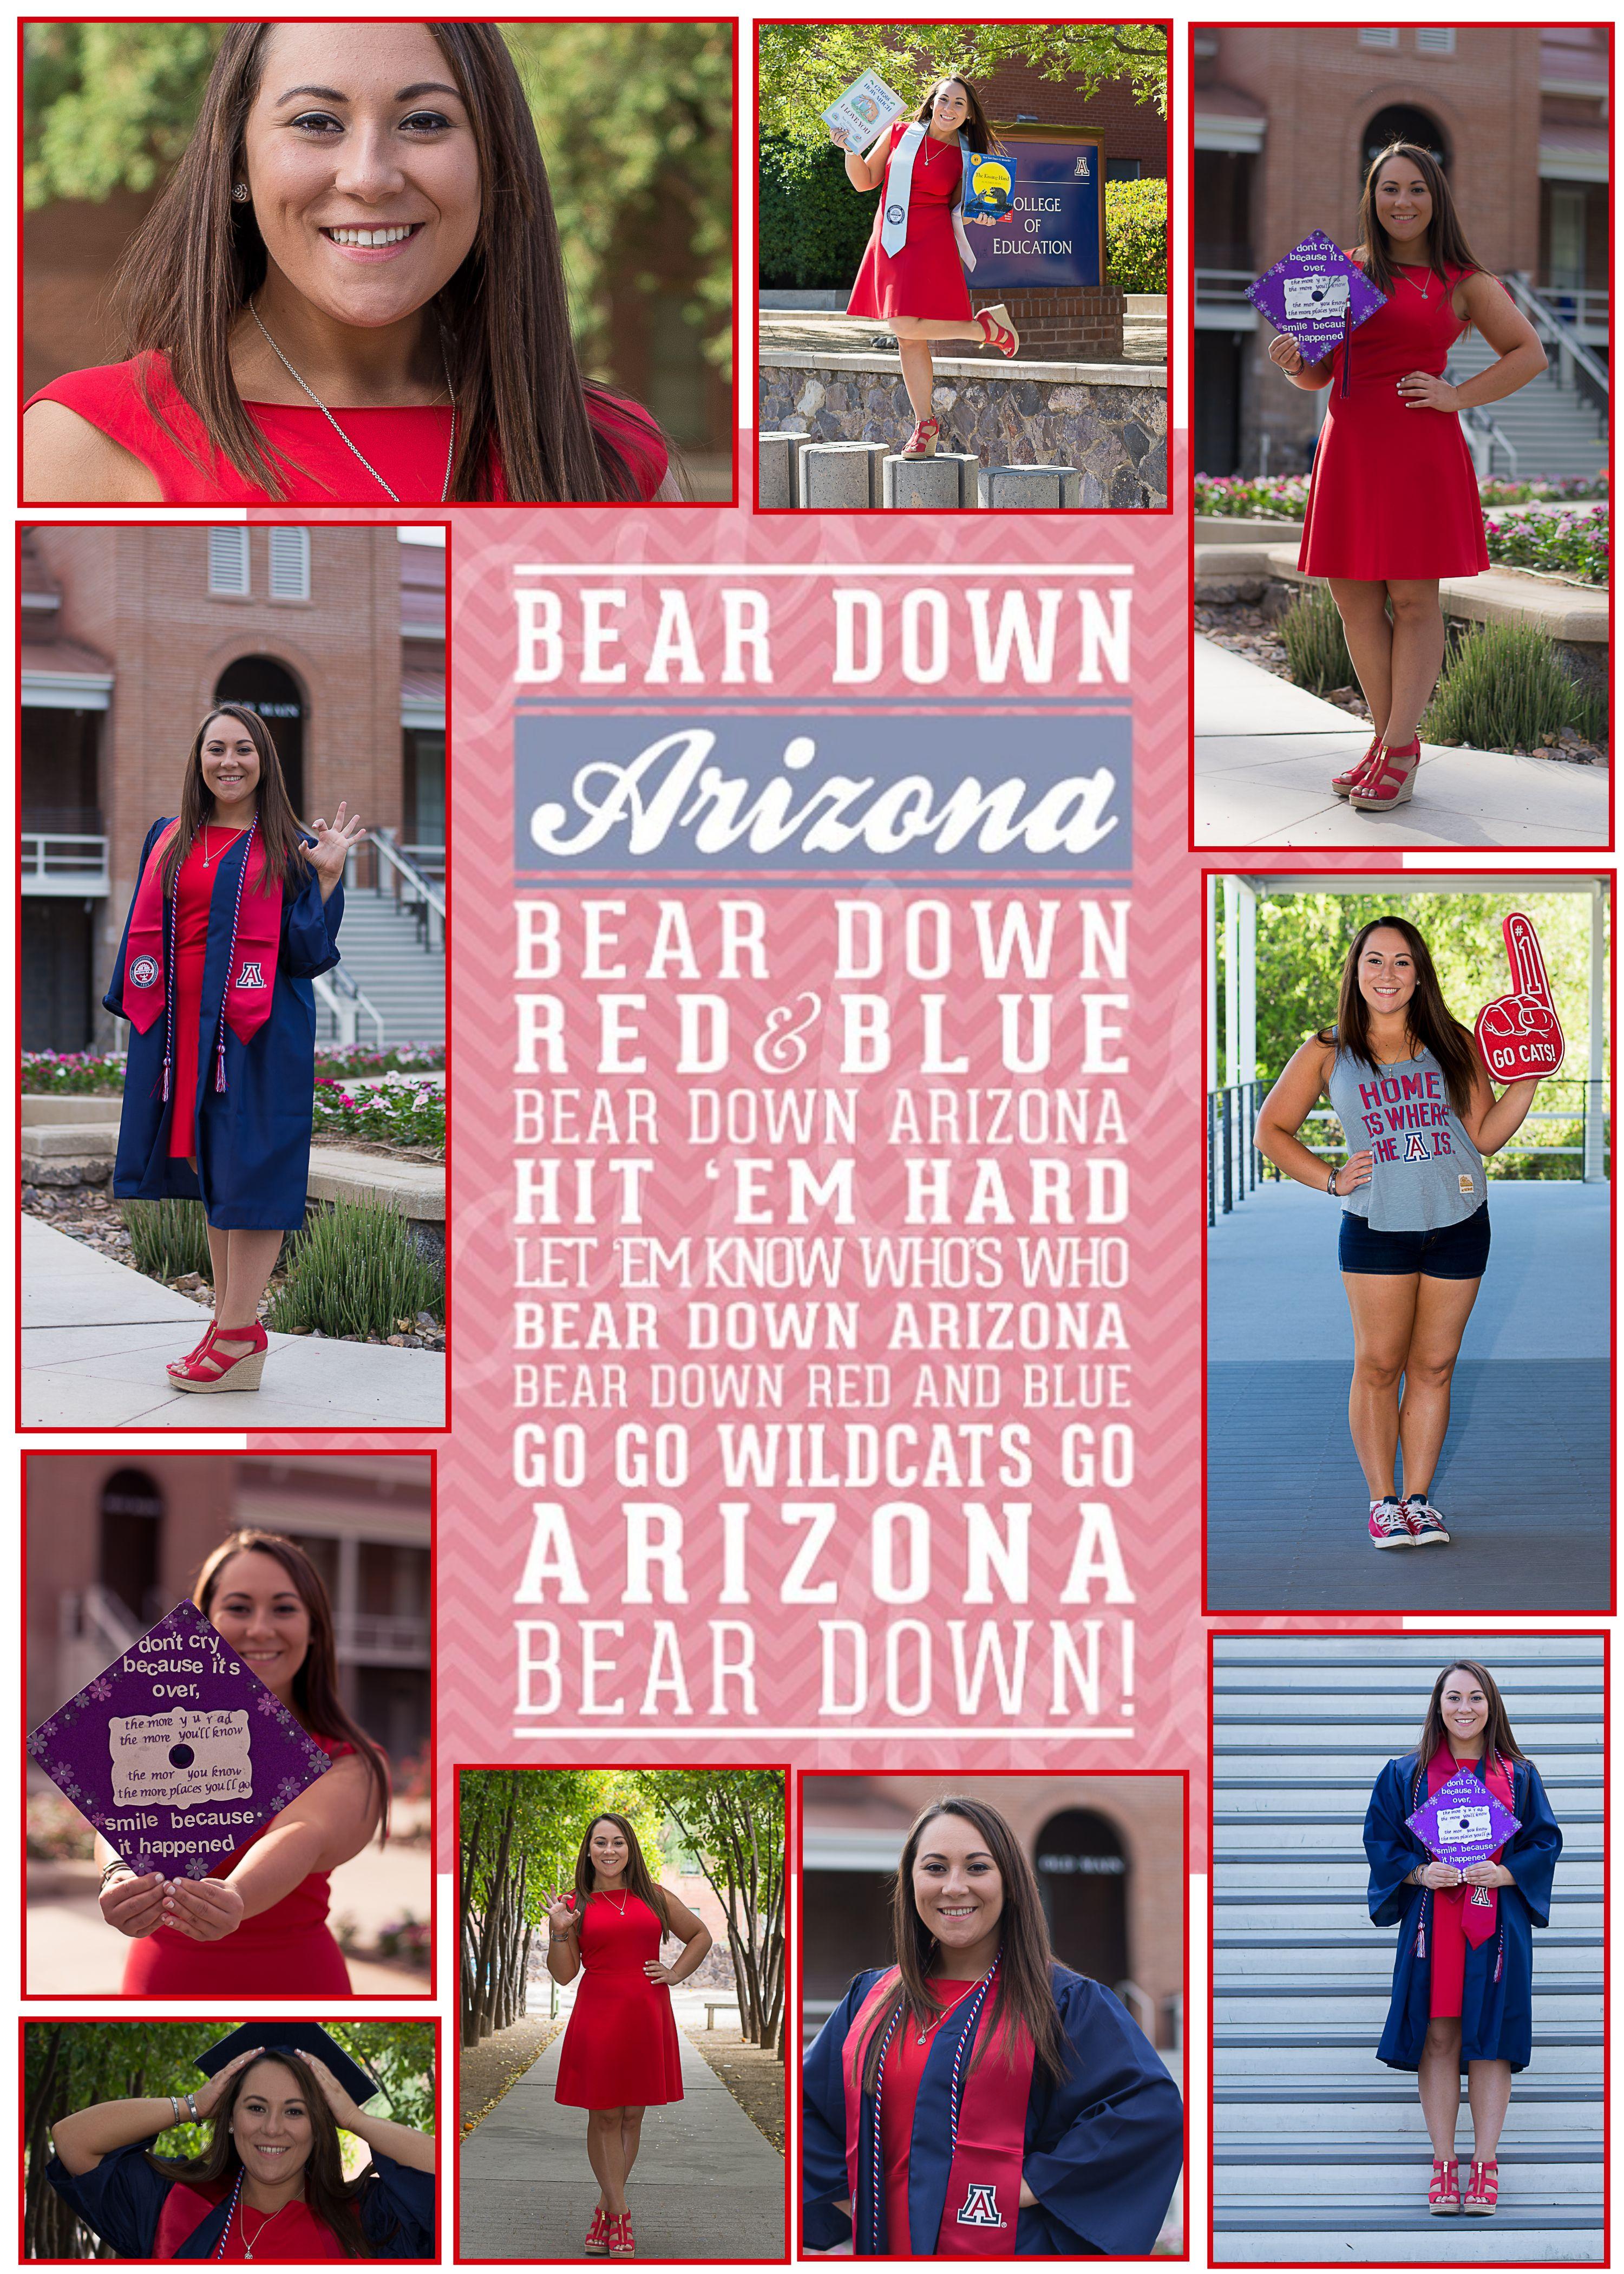 GirlsDElta 53 17 Best images about University of Arizona on Pinterest   Graduation  photos, Arizona and Old school